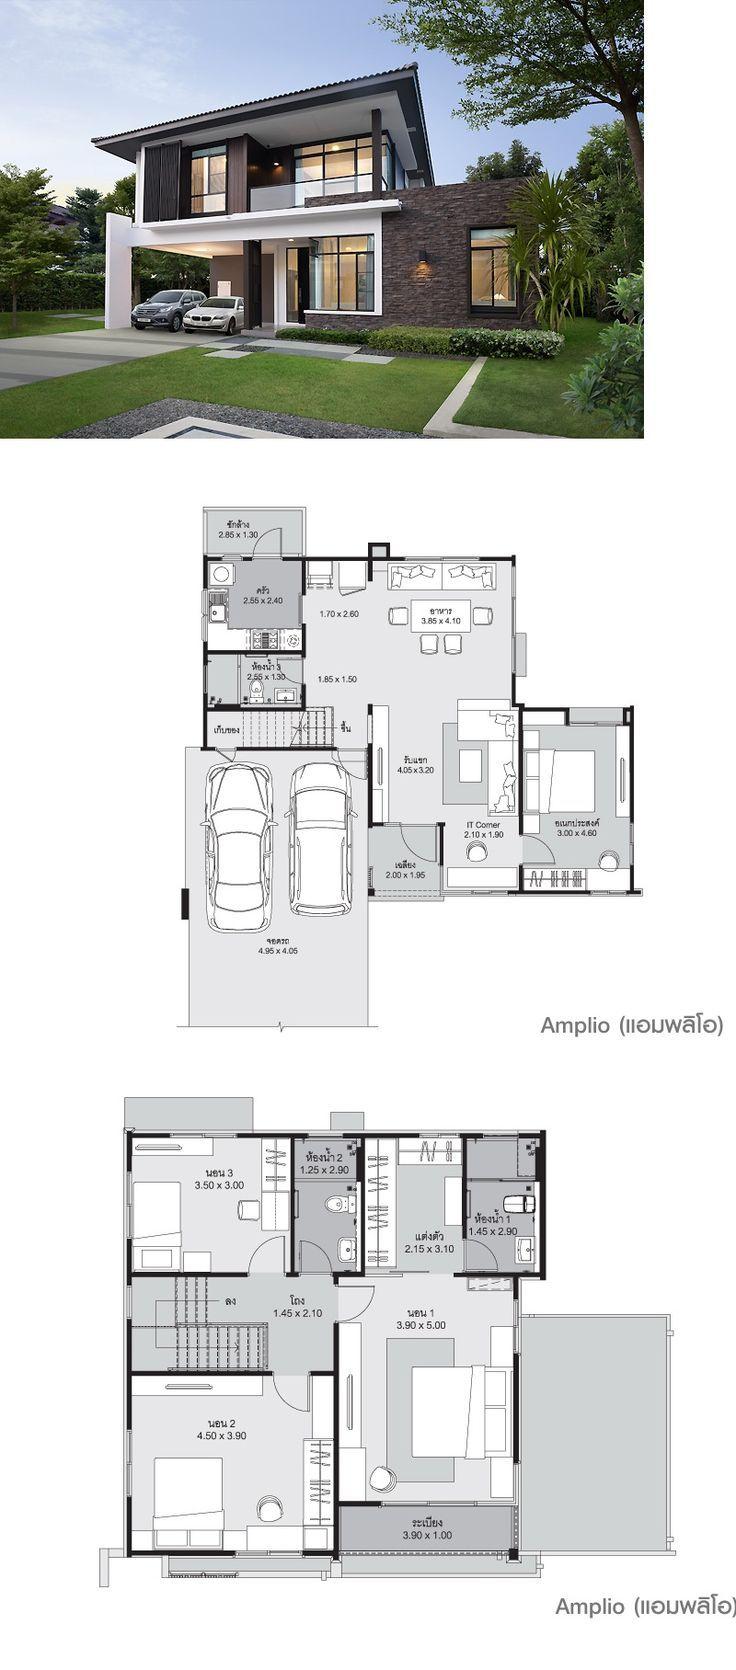 736 1670 architecture pinterest house architecture for Architecture petite villa